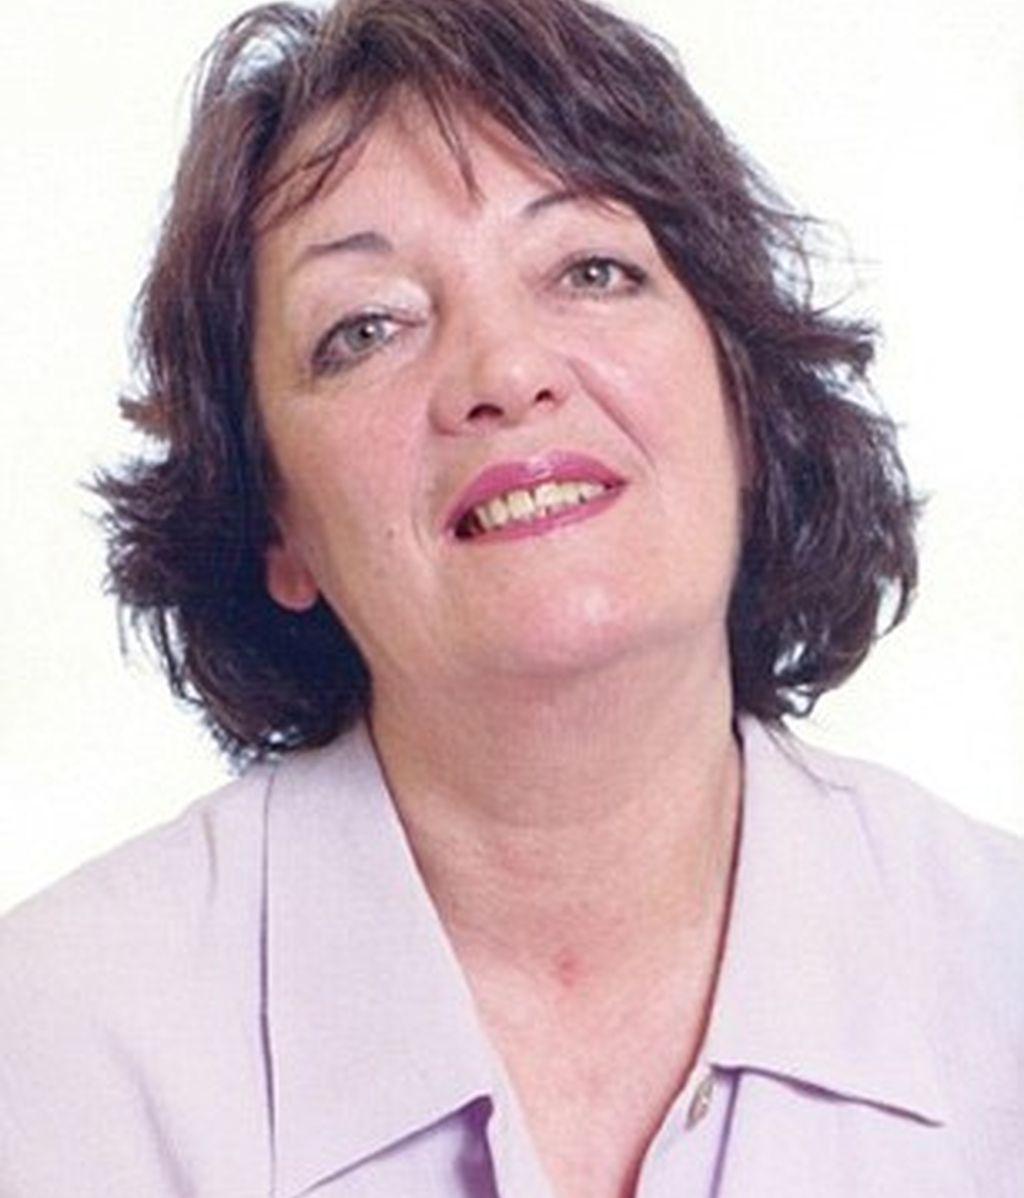 mujer,dada por muerta,Ann Saville,Leed,Reino Unido,hospital público,